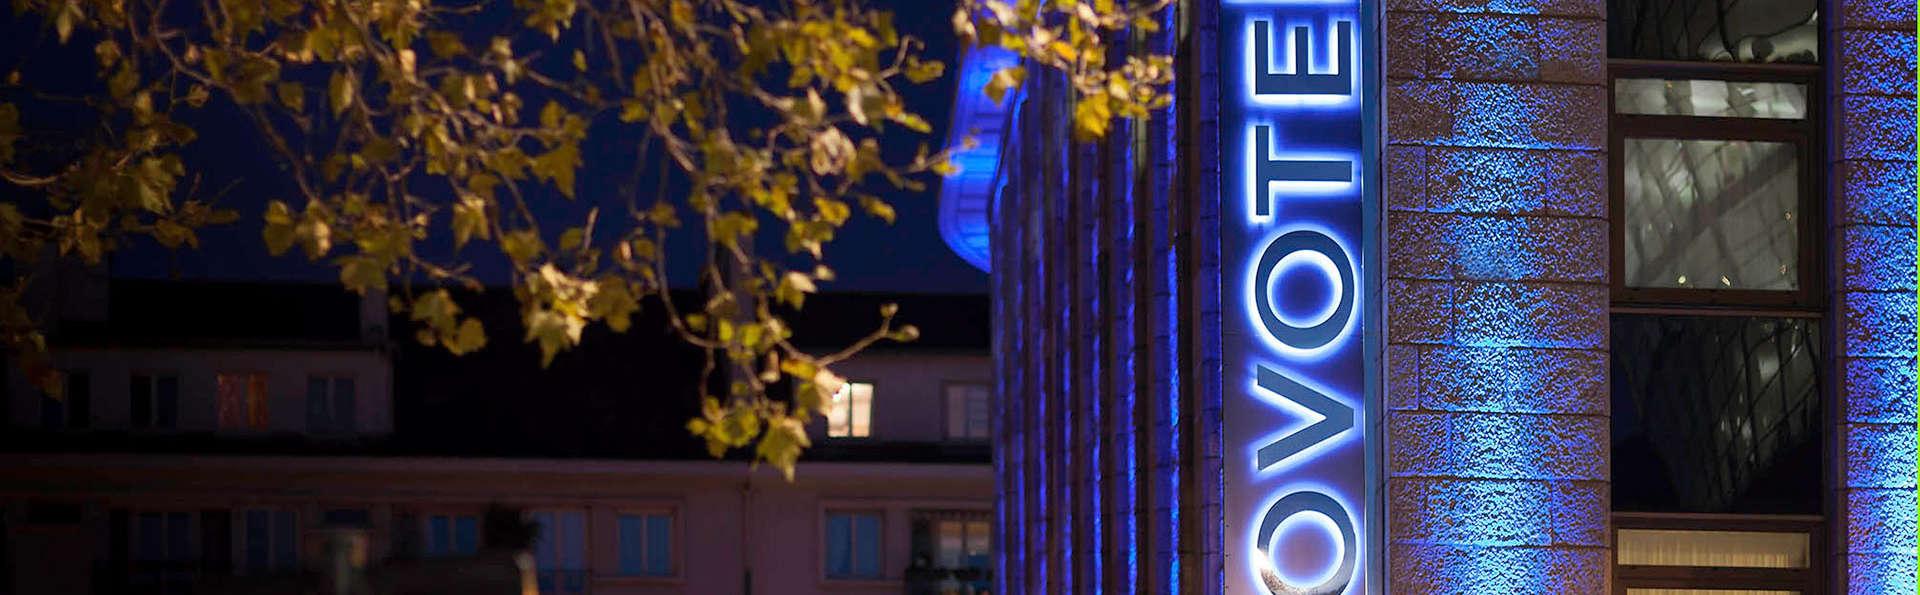 Novotel Spa Rennes Centre Gare - Edit_Front.jpg